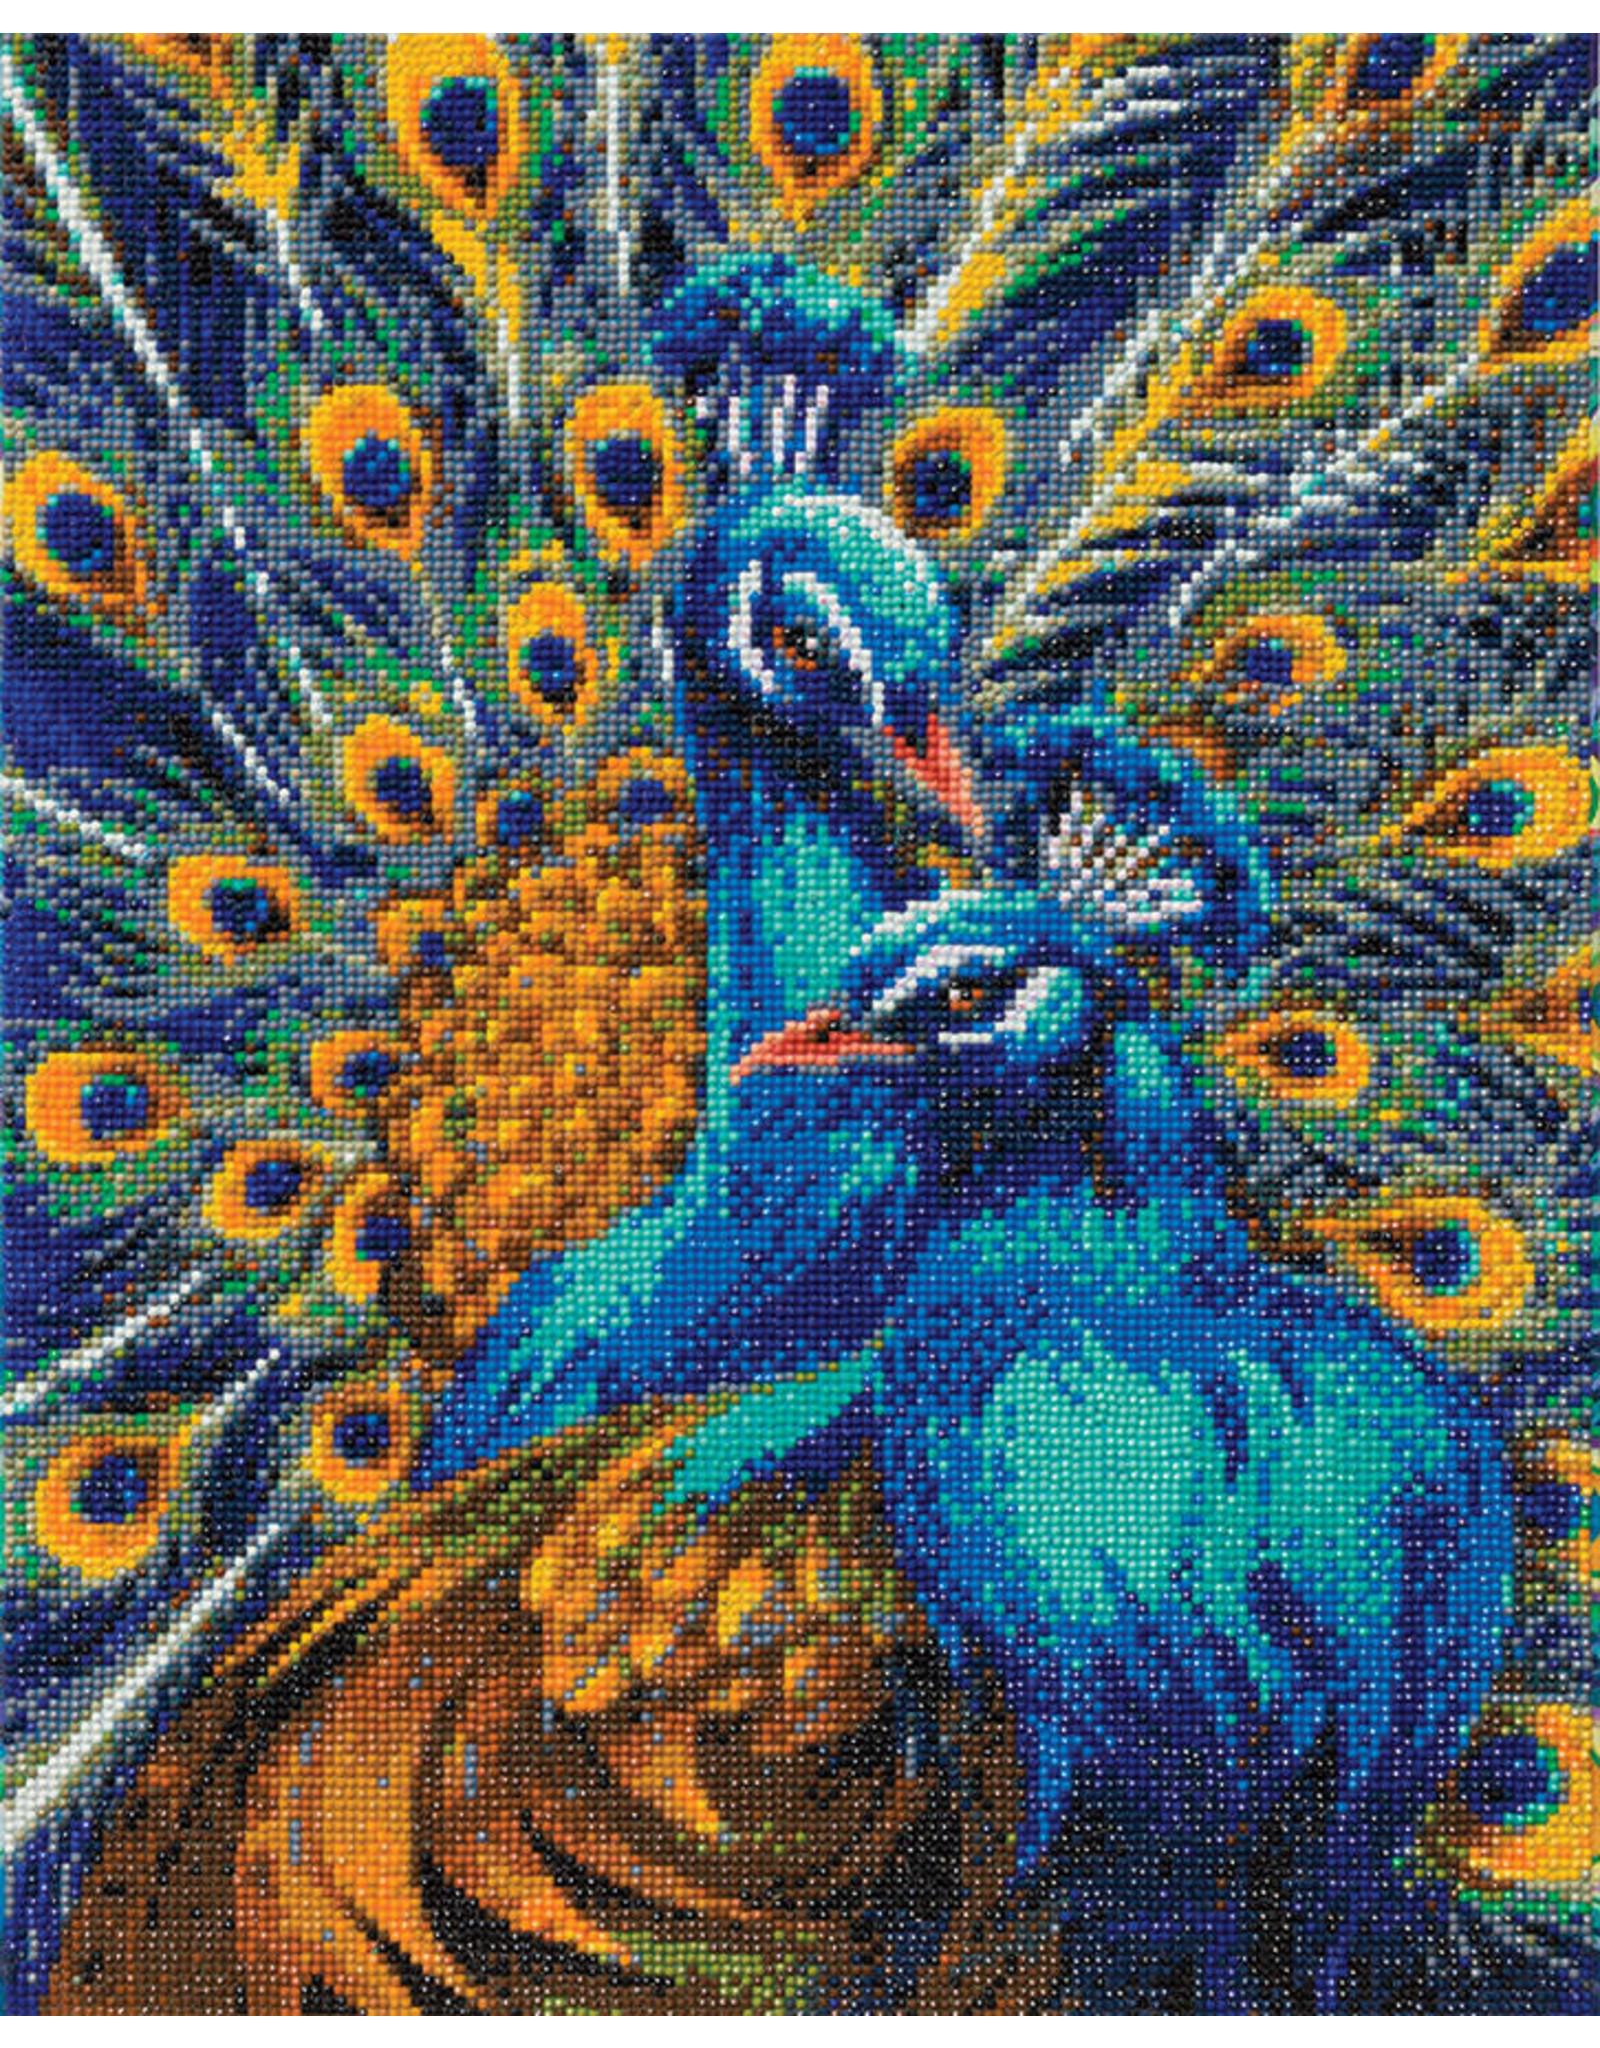 D.I.Y Crystal Art Kit Crystal Art Large Framed Kit - Blue Rapsody Peacocks